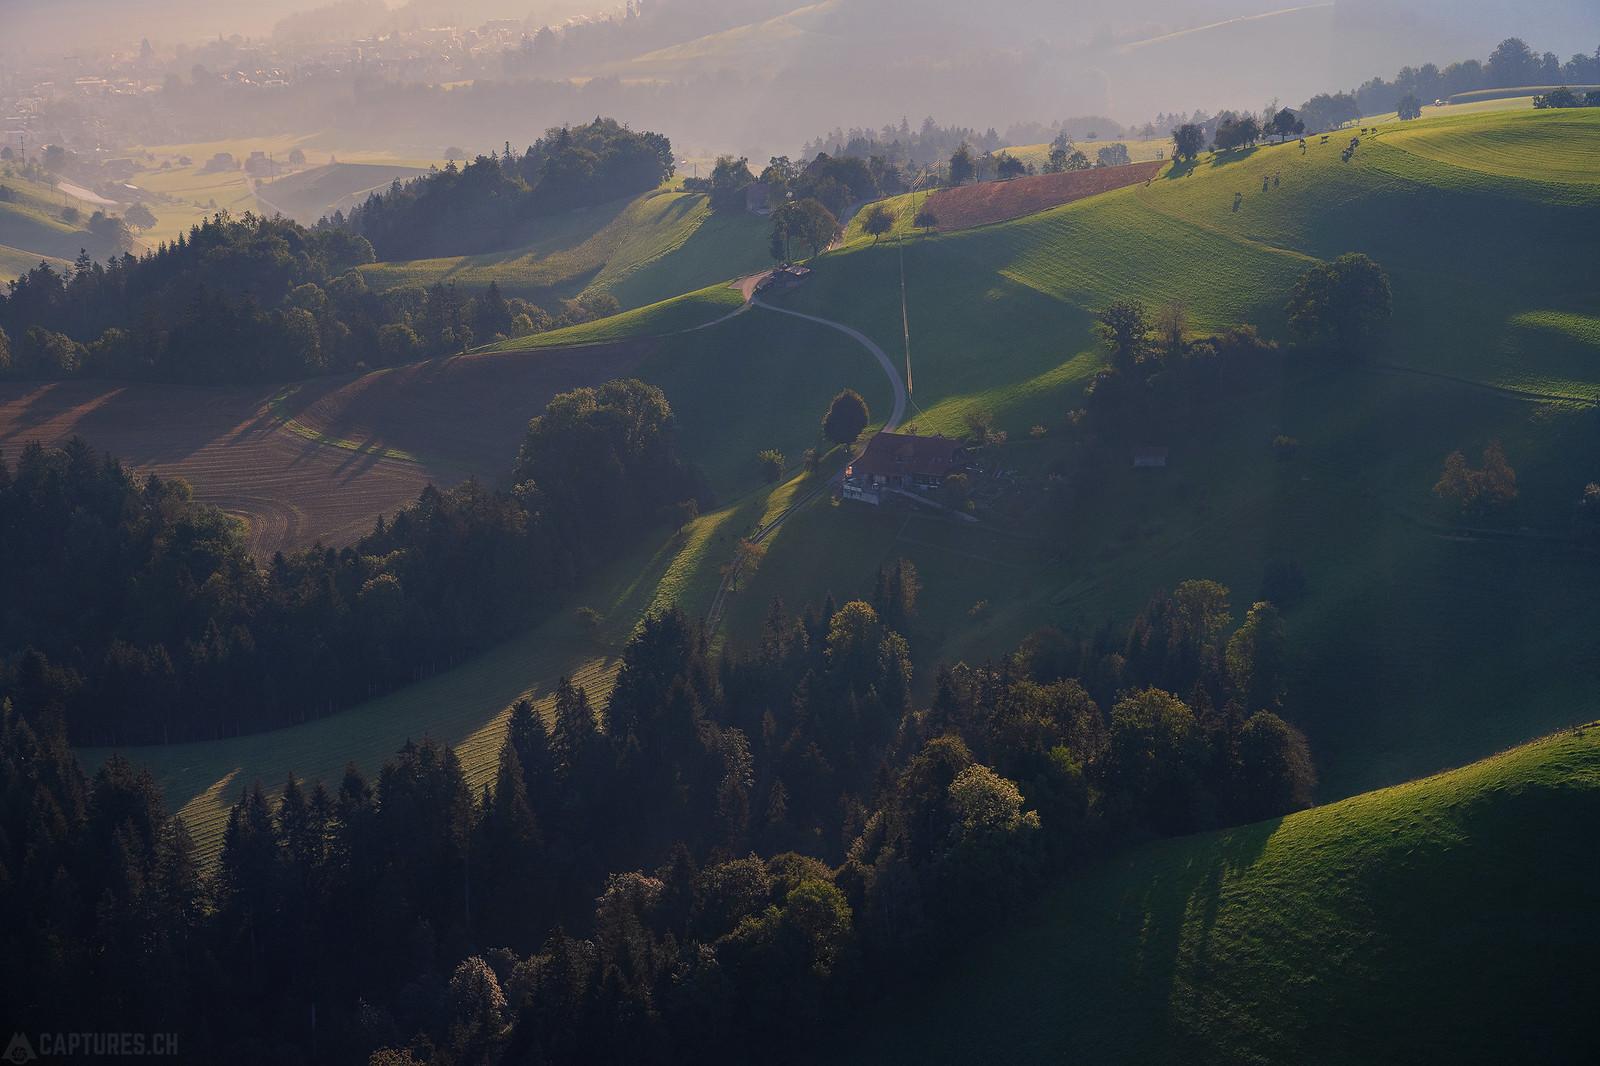 Hills - Sumiswald